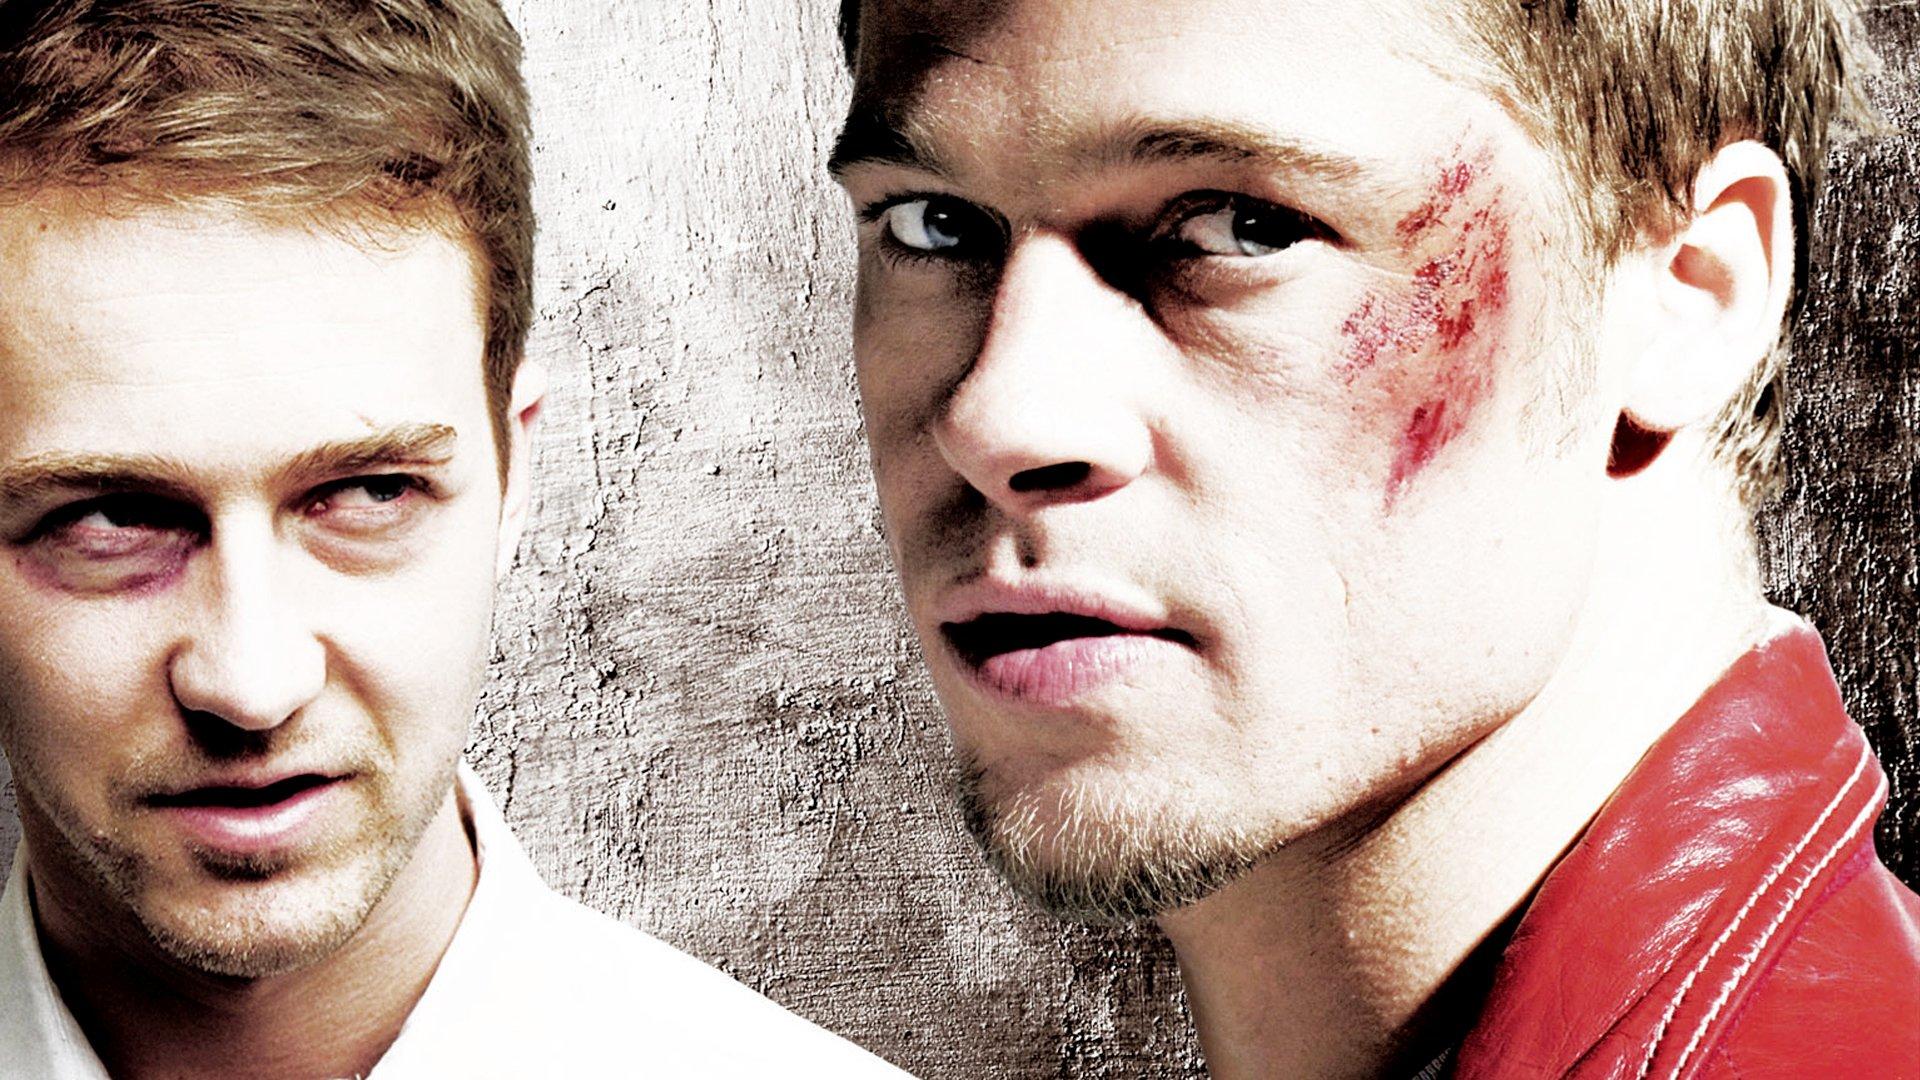 Fight Club Hd Wallpaper Background Image 1920x1080 Id 675503